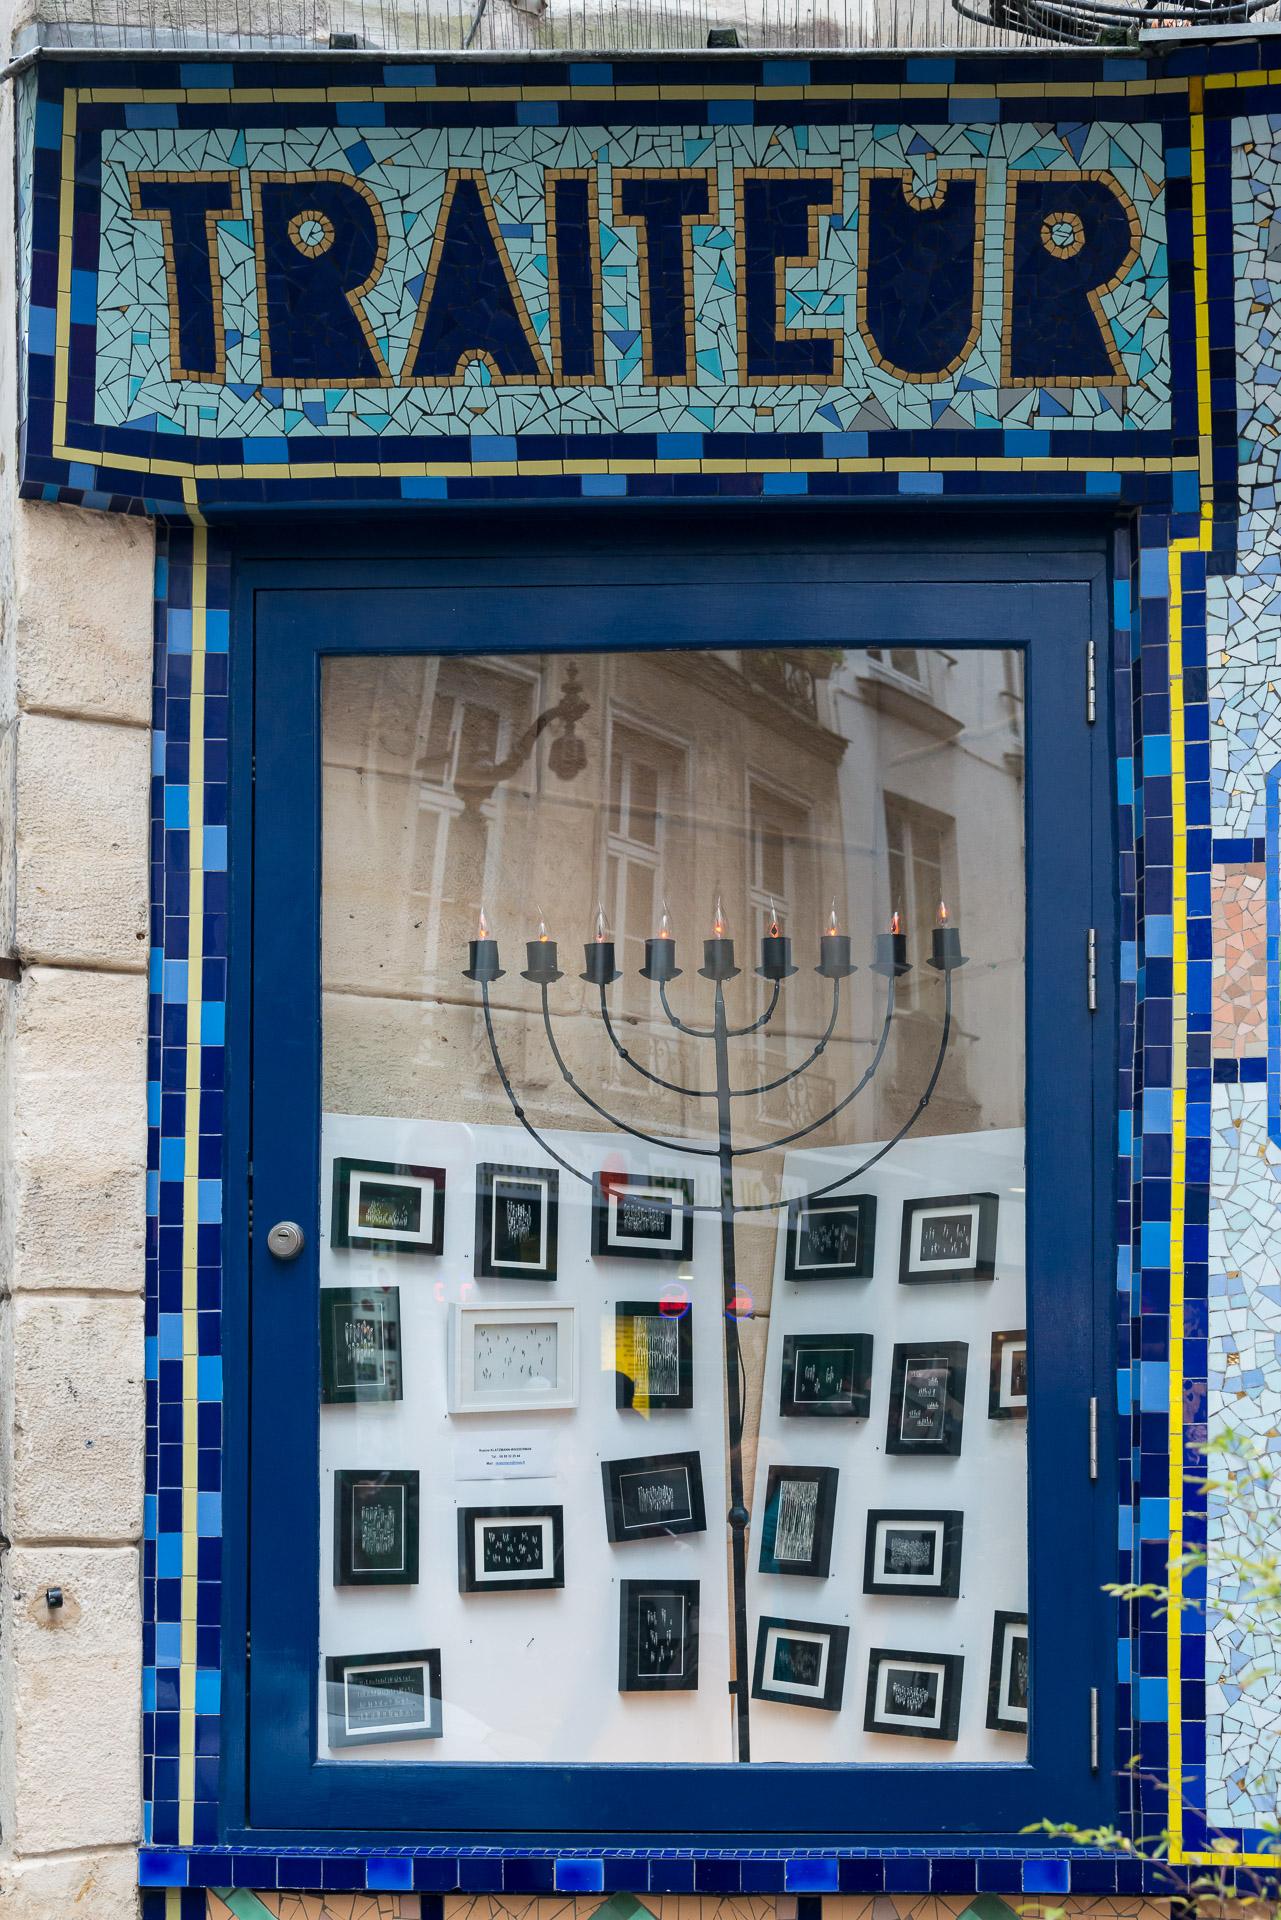 Parisian Shopping-05-2015-01-26